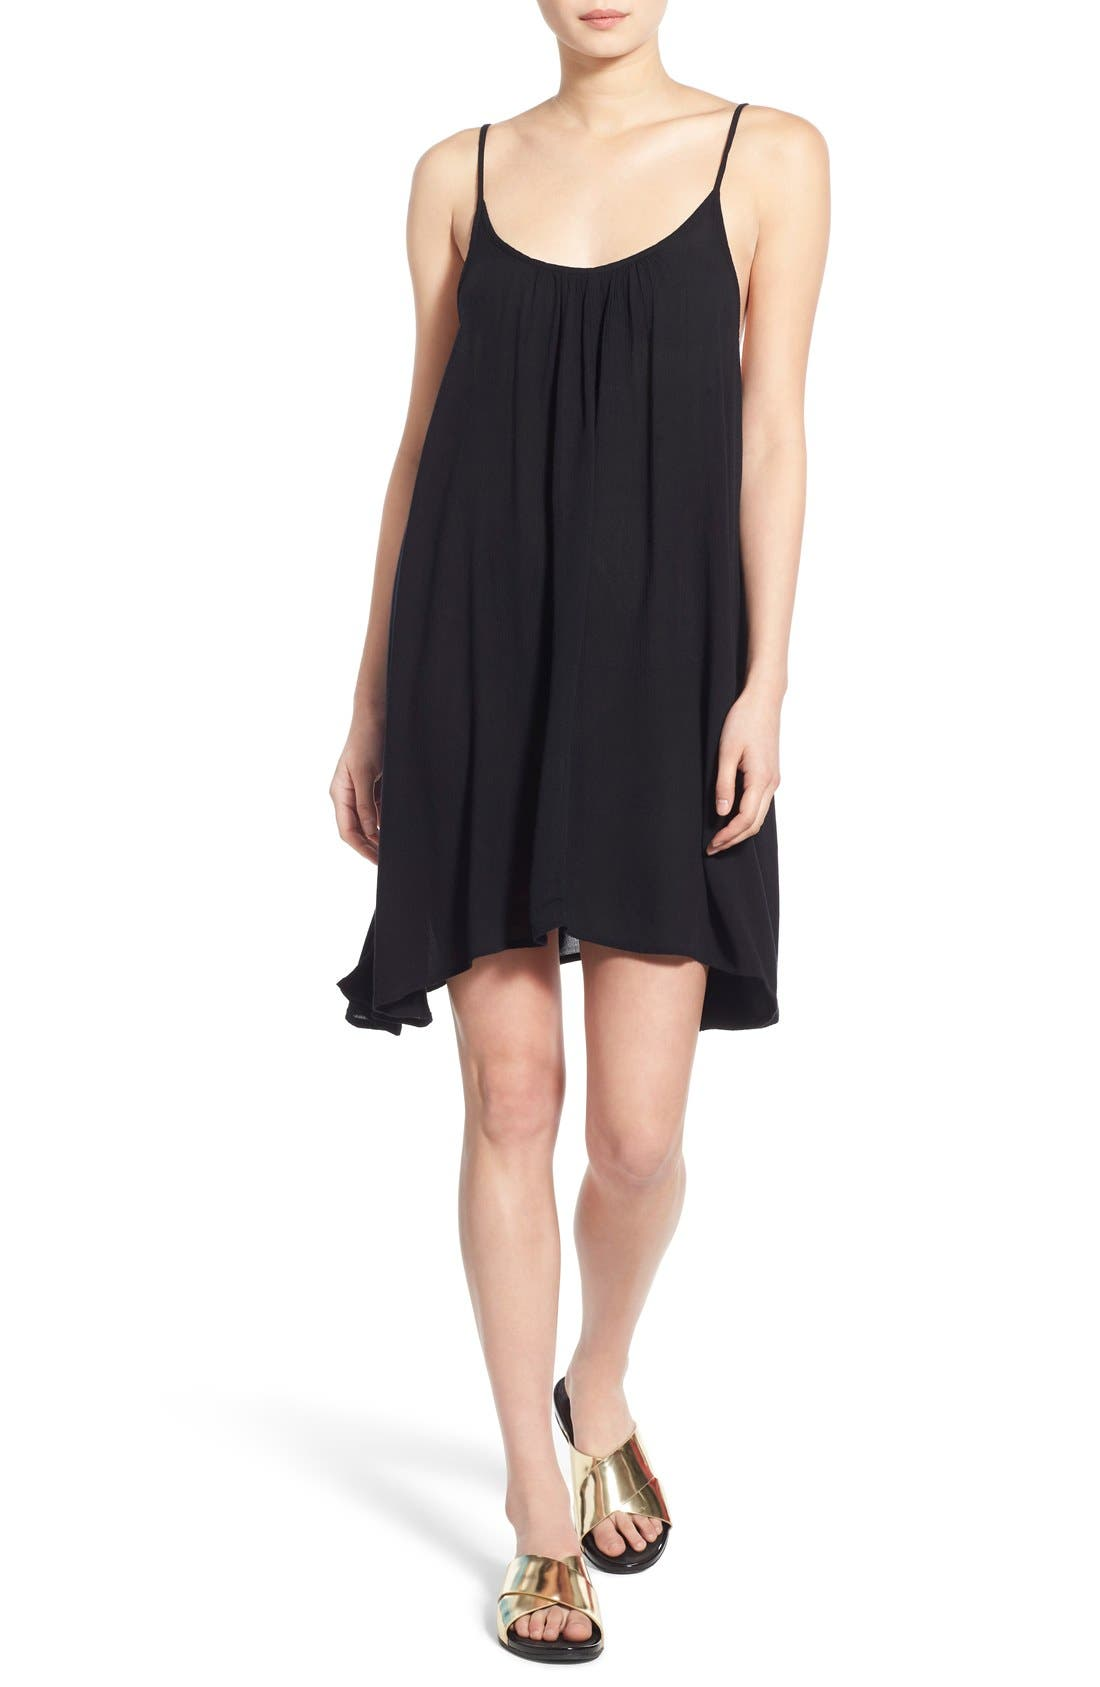 Alternate Image 1 Selected - Roxy 'Windy' Scoop Neck Shift Dress